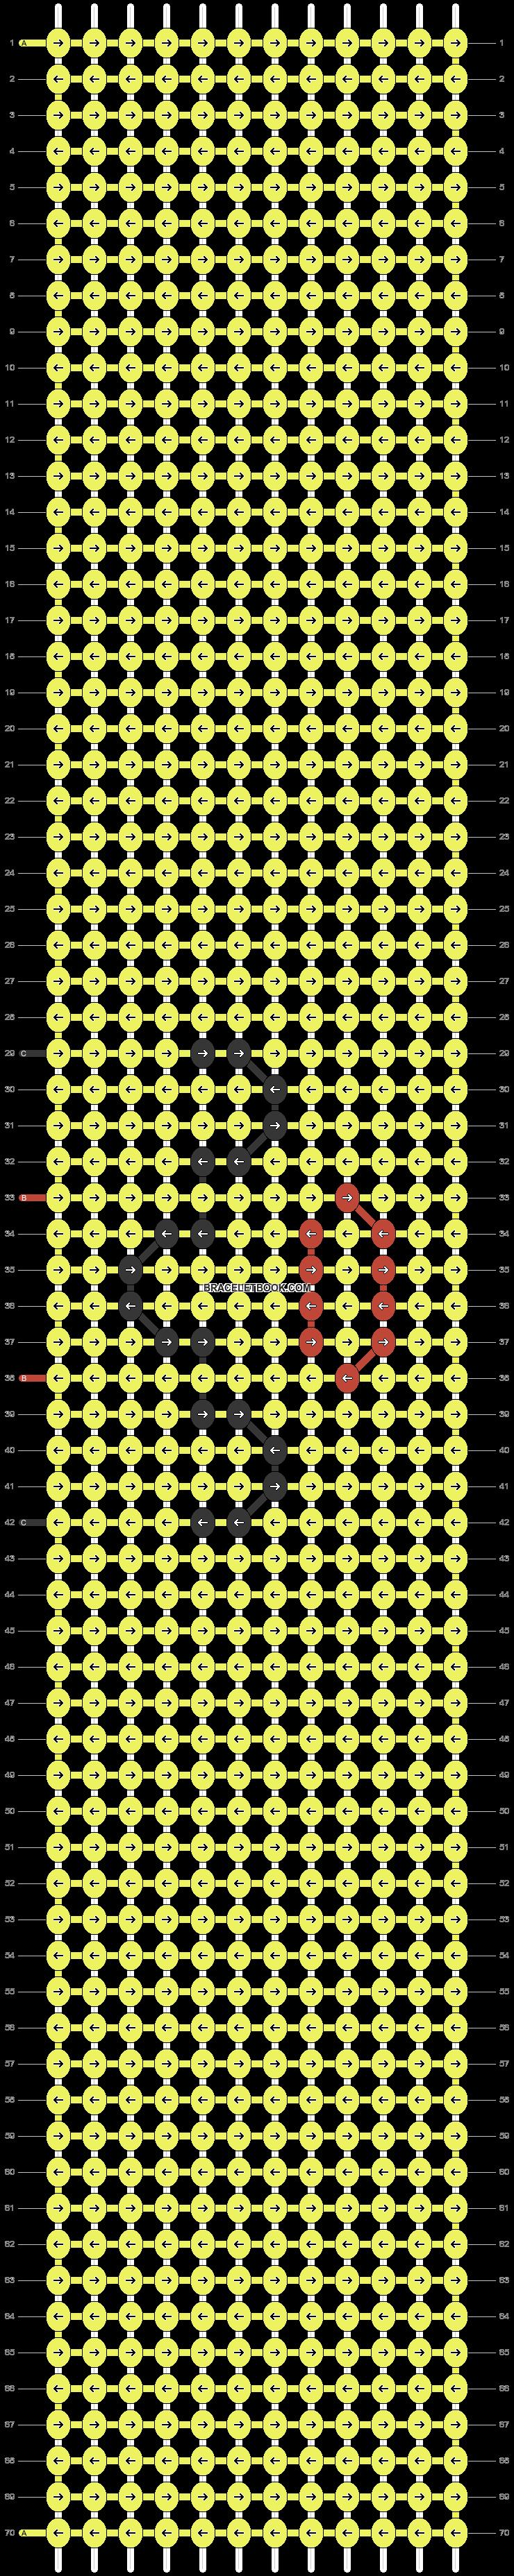 Alpha pattern #47915 variation #75715 pattern